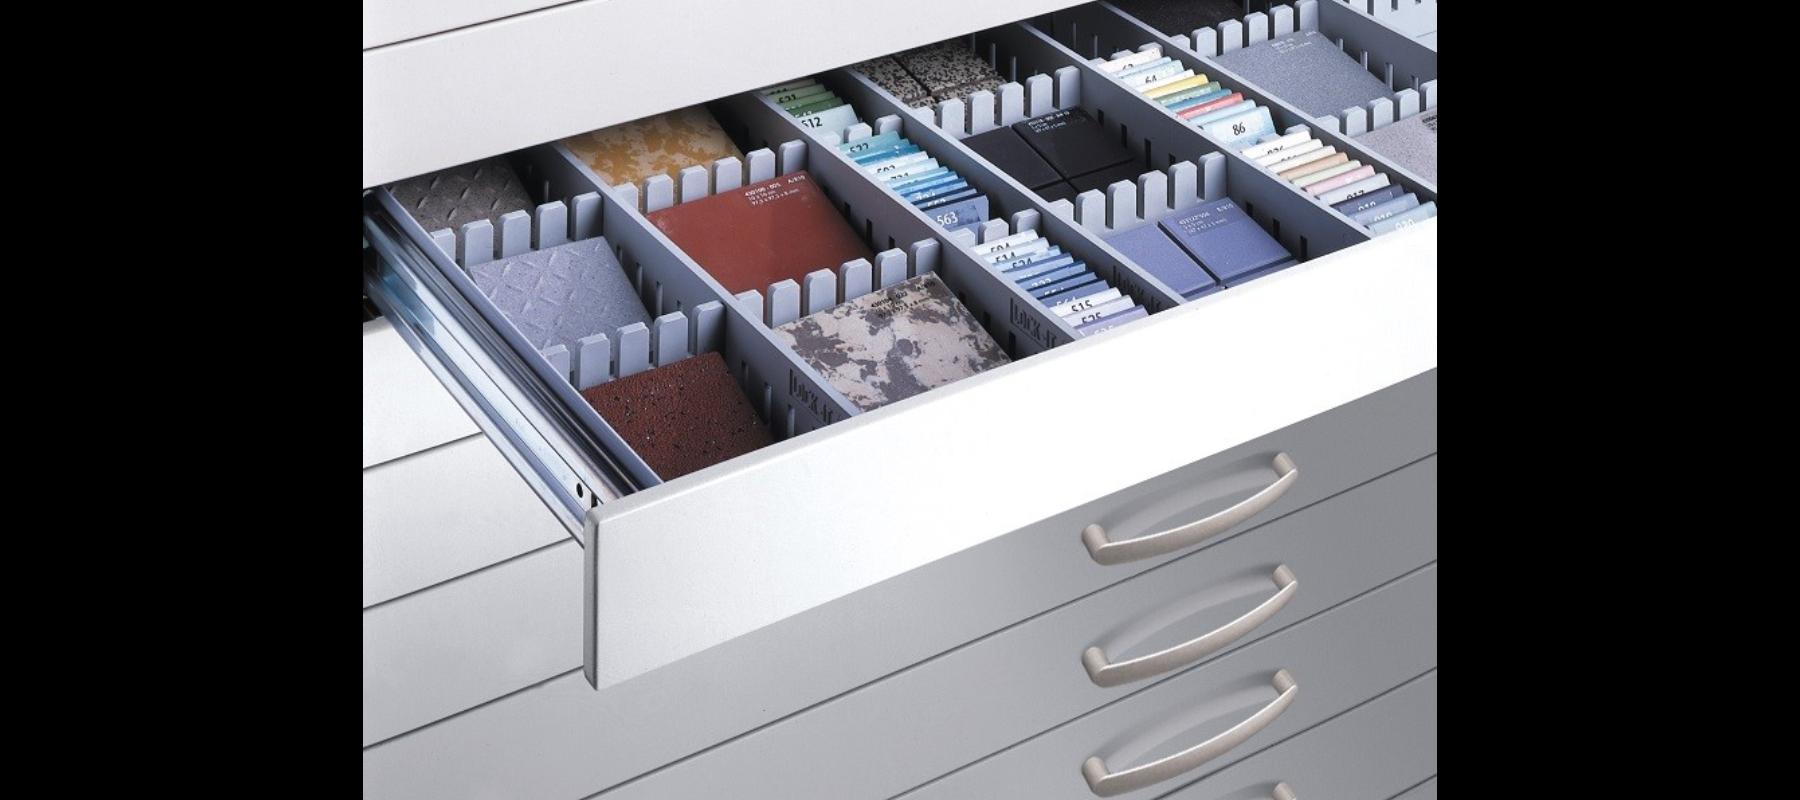 metalowe meble biurowe szafy szufladowe cp detale - 12